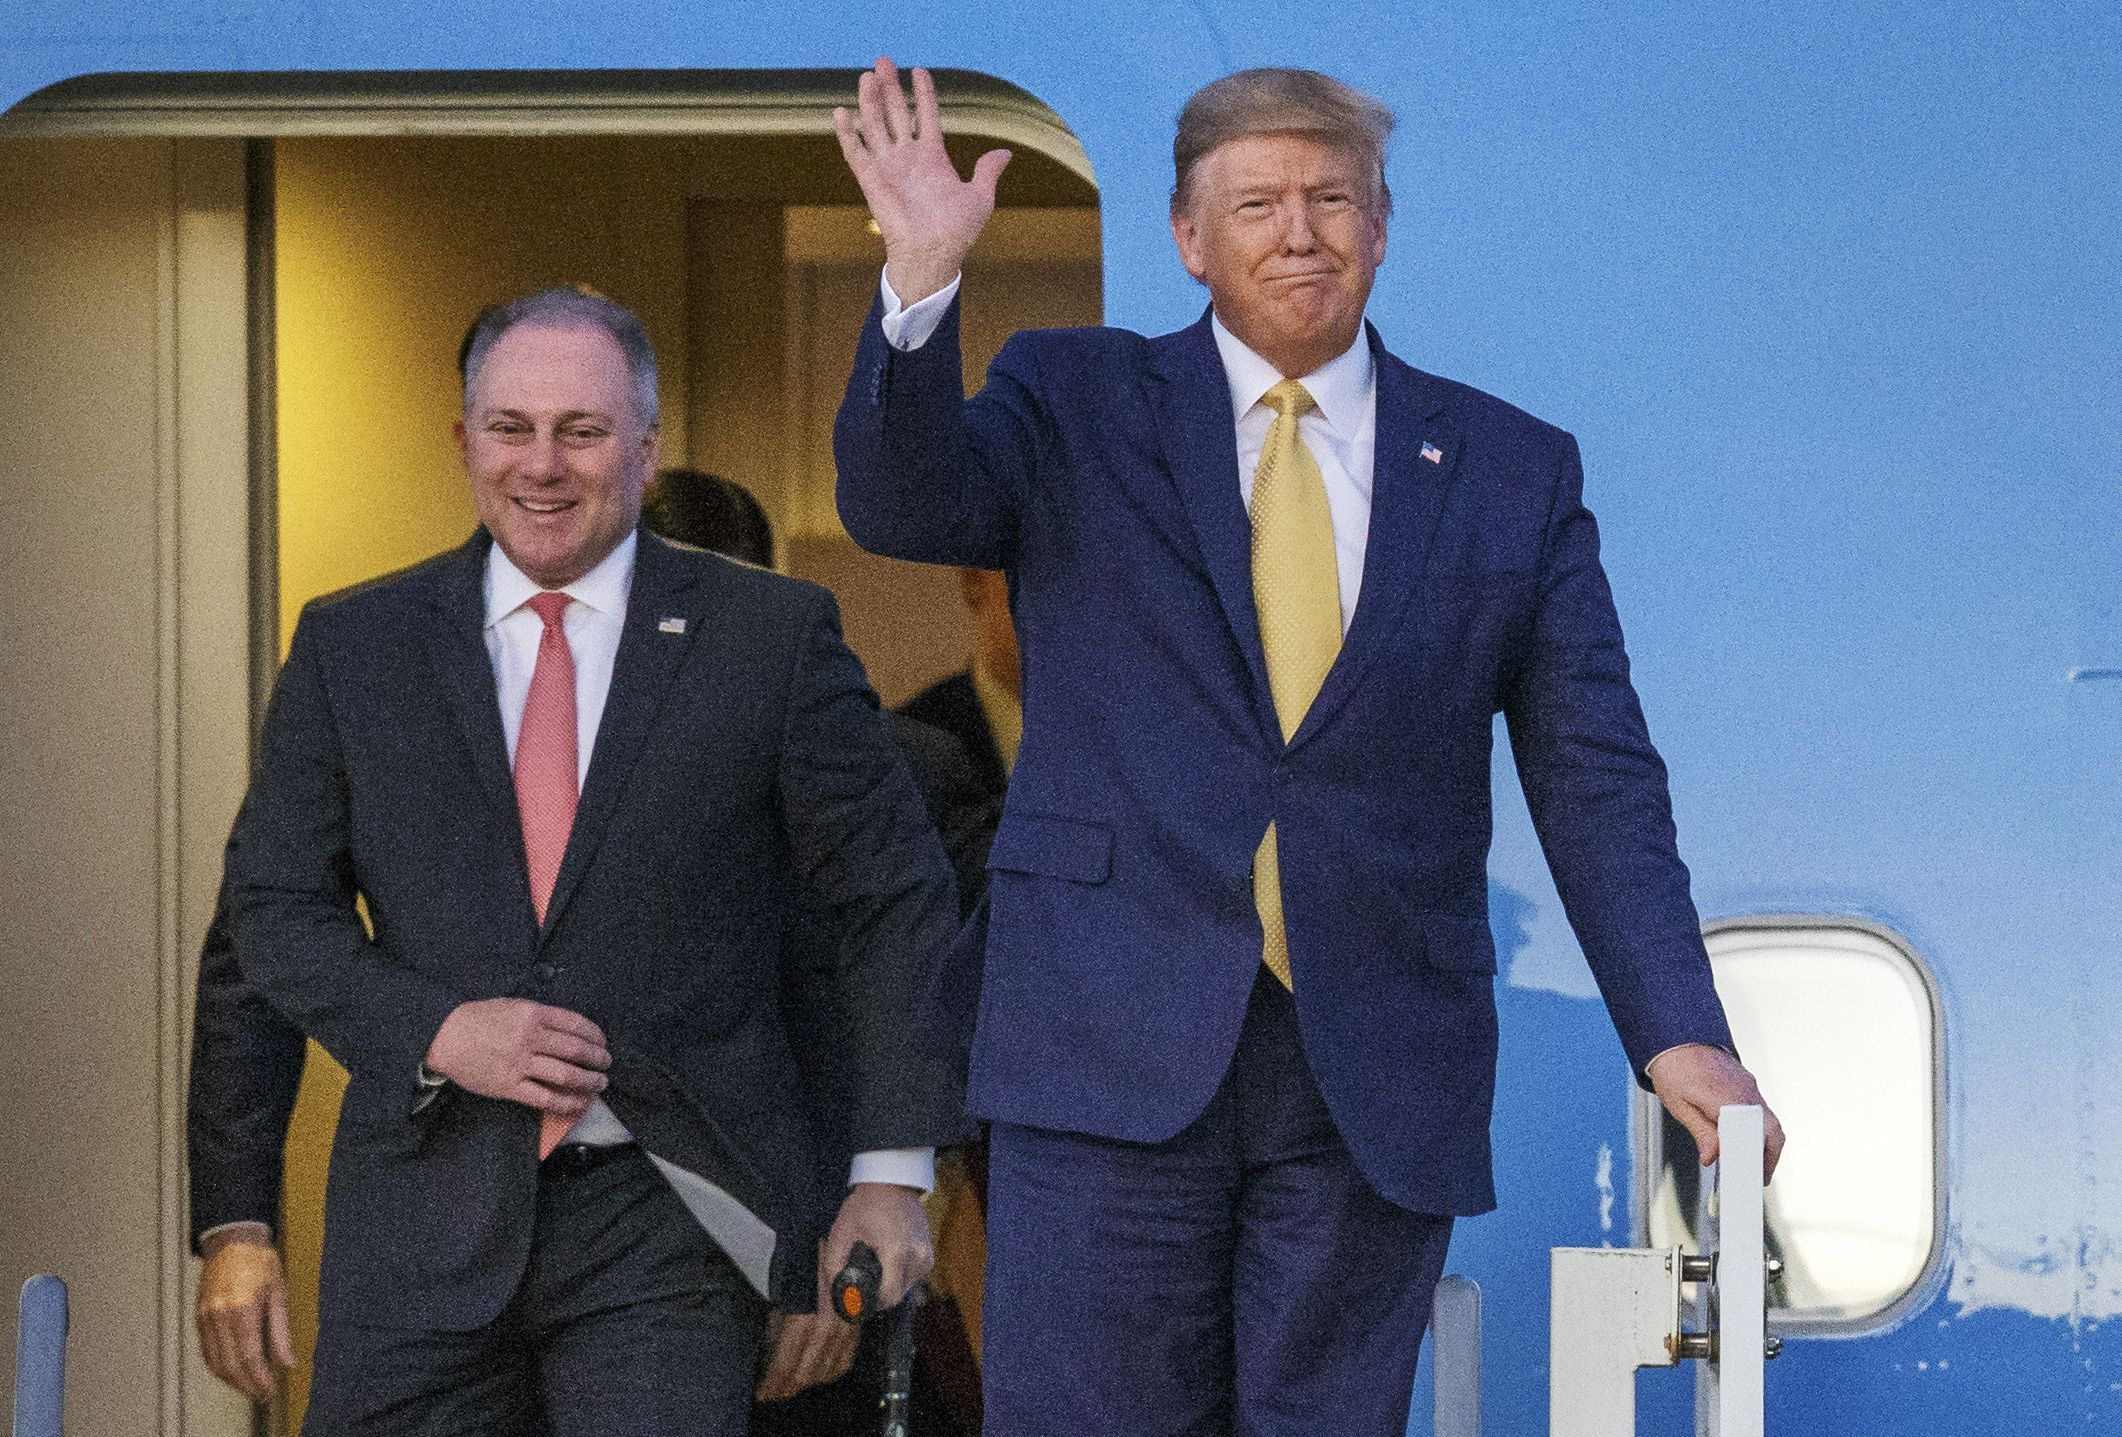 republicano scalise se rehusa a admitir derrota de trump